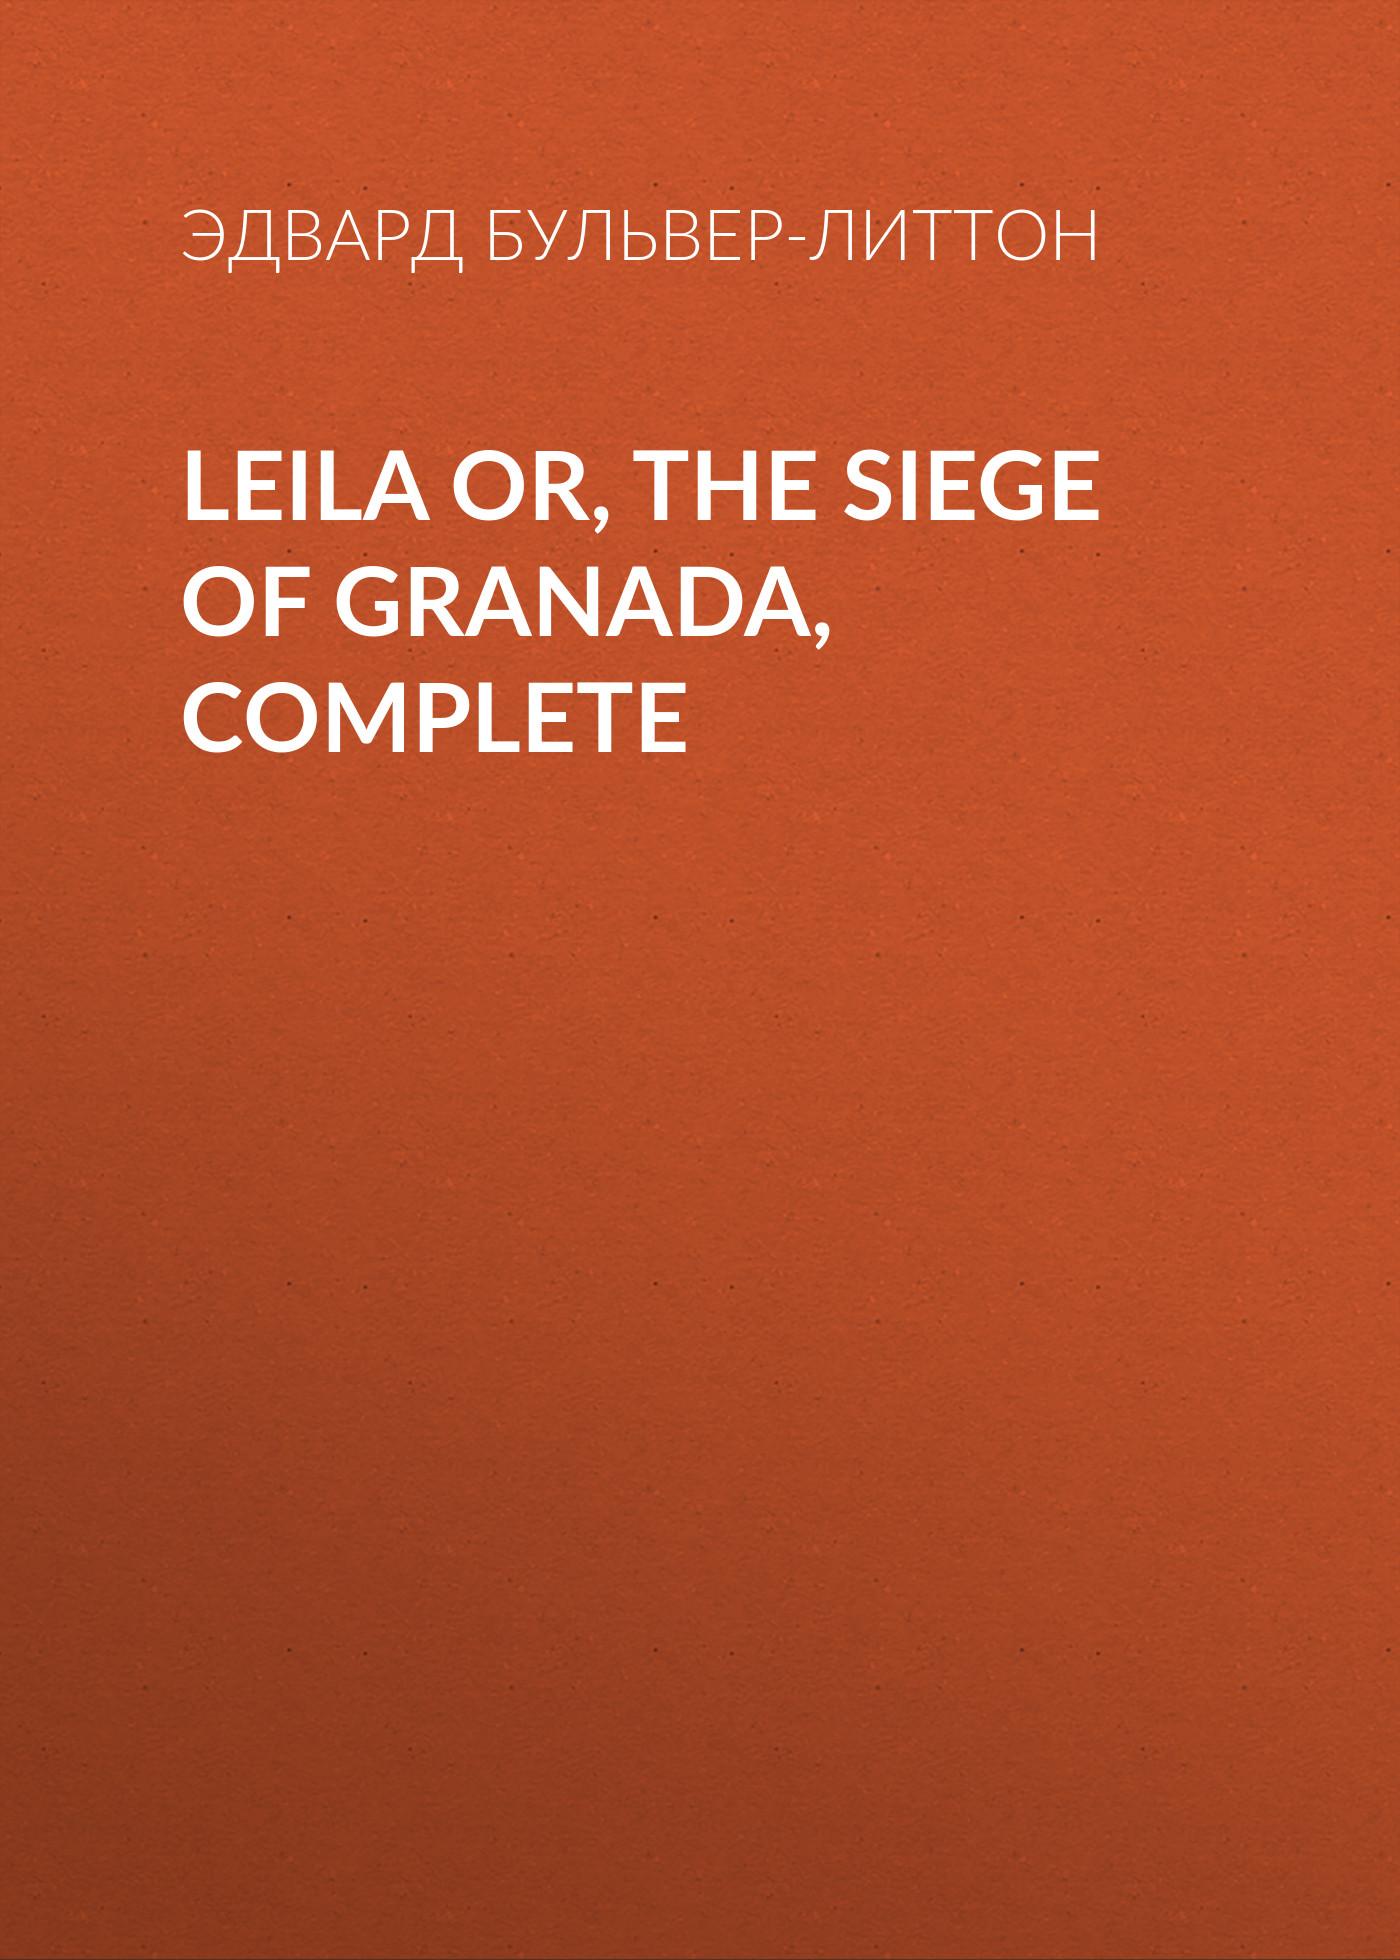 Leila or, the Siege of Granada, Complete ( Эдвард Бульвер-Литтон  )